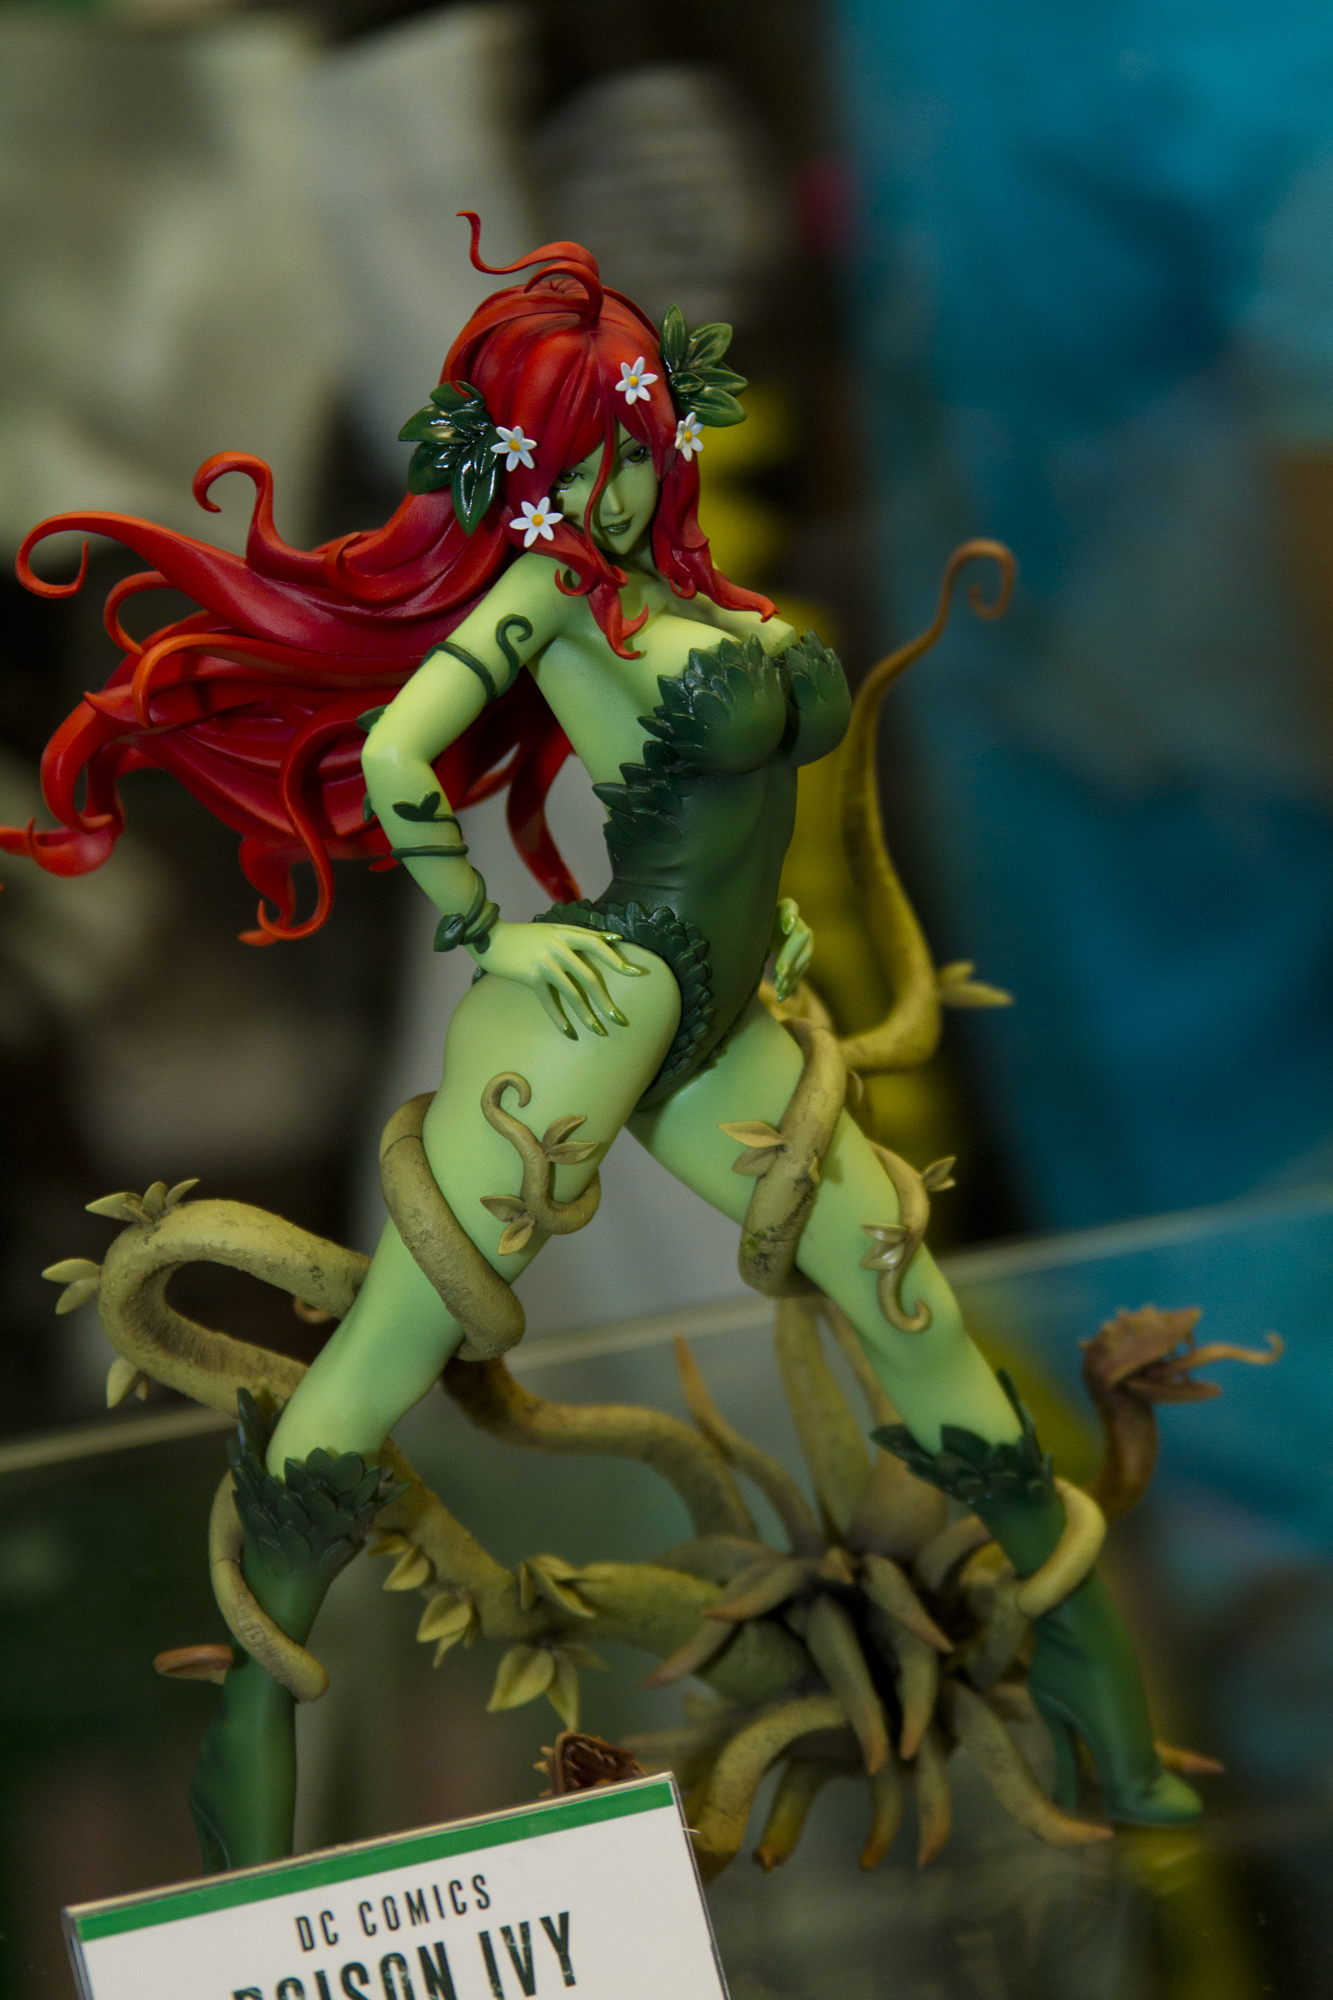 kotobukiya green_skin red_hair batman yamashita_shunya dc_x_bishoujo poison_ivy bishoujo_statue